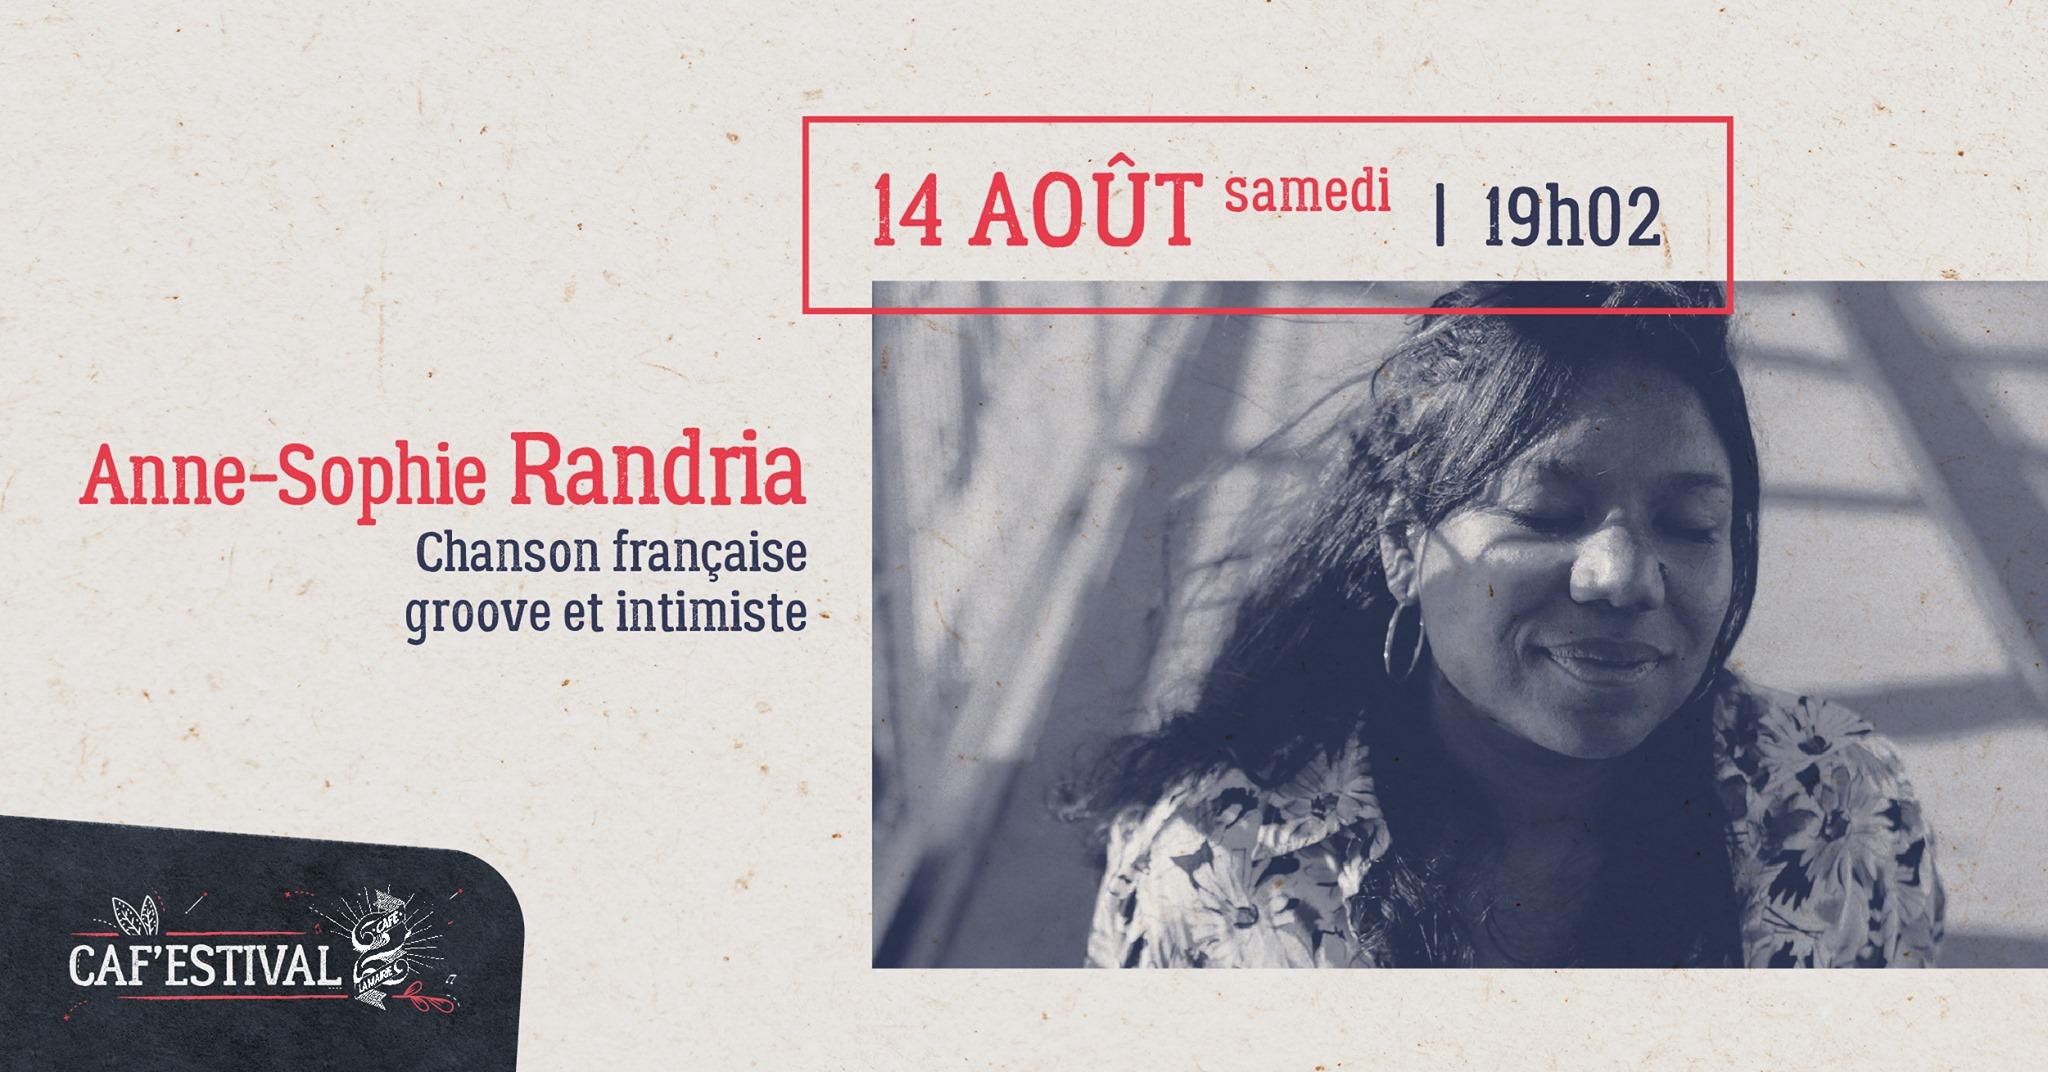 Anne Sophie Randria 14 08